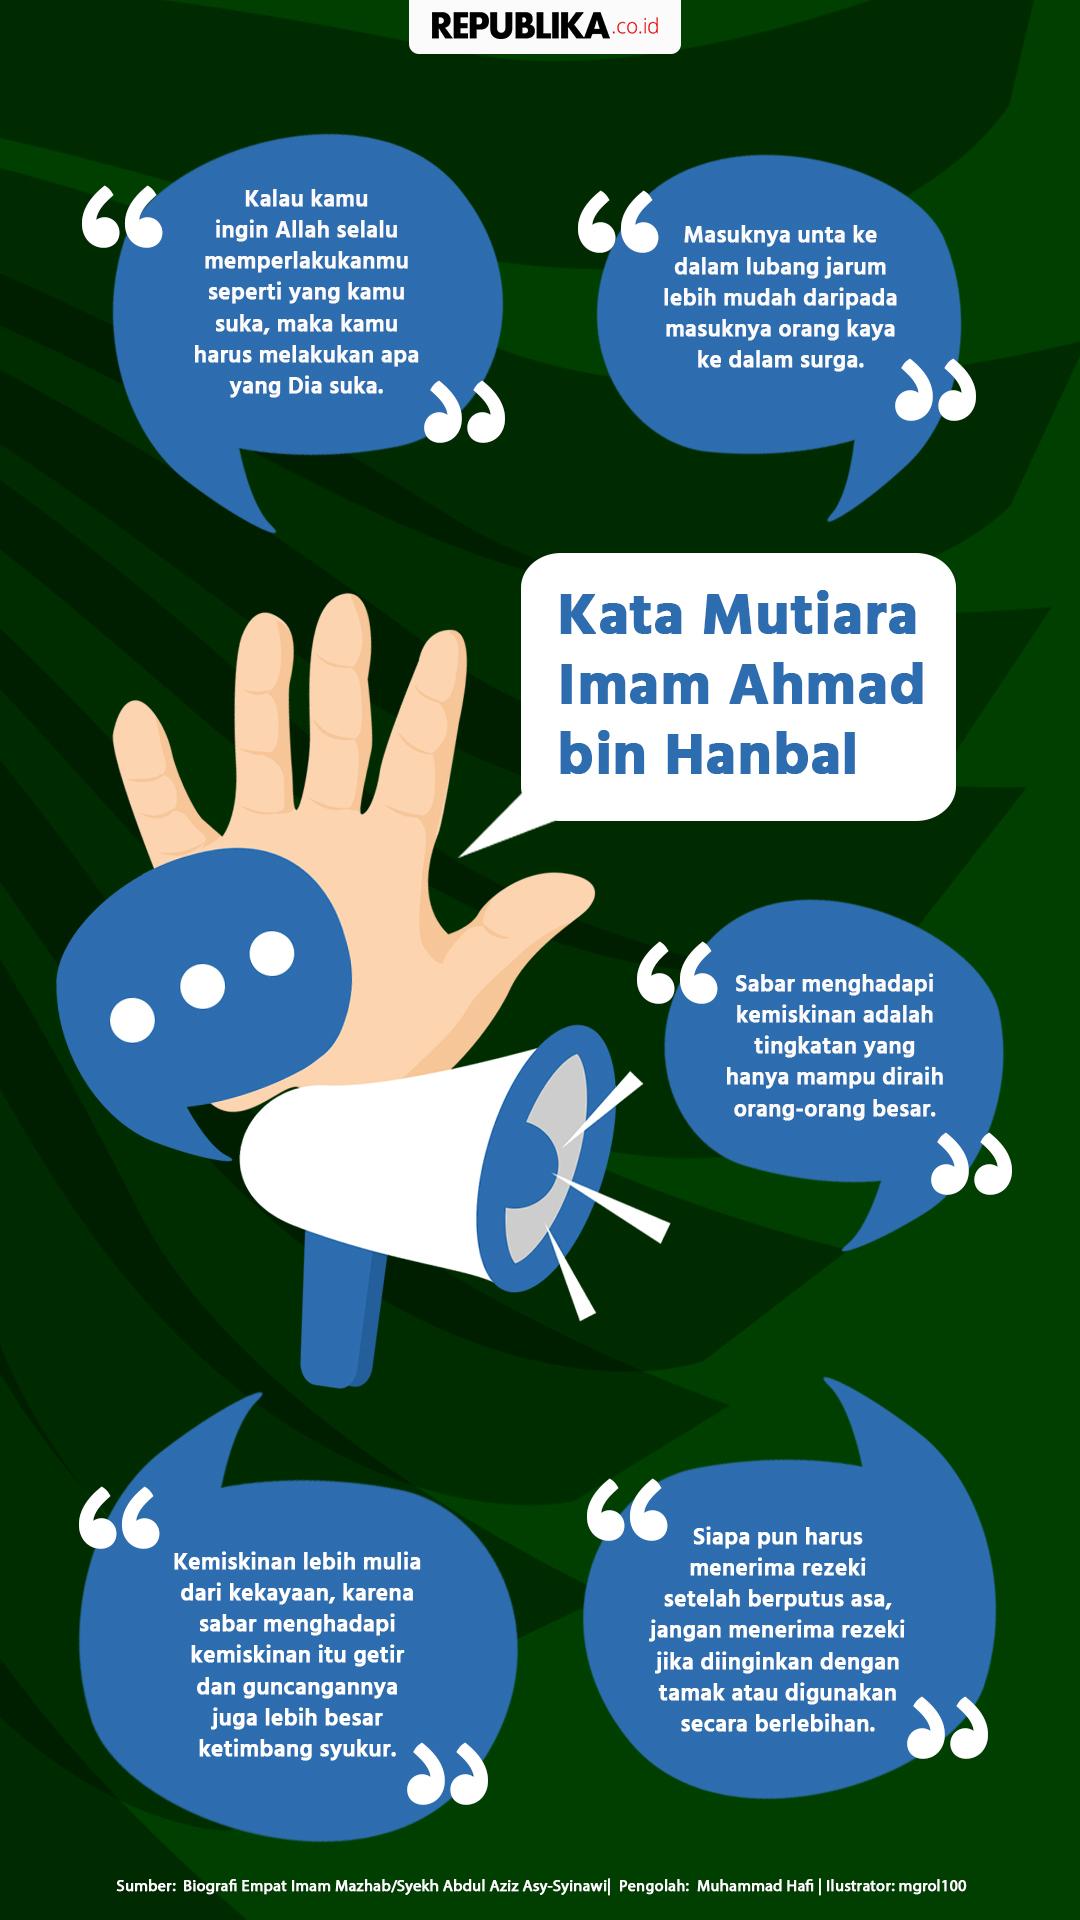 Lima Kata Kata Mutiara Imam Ahmad Bin Hanbal Republika Online